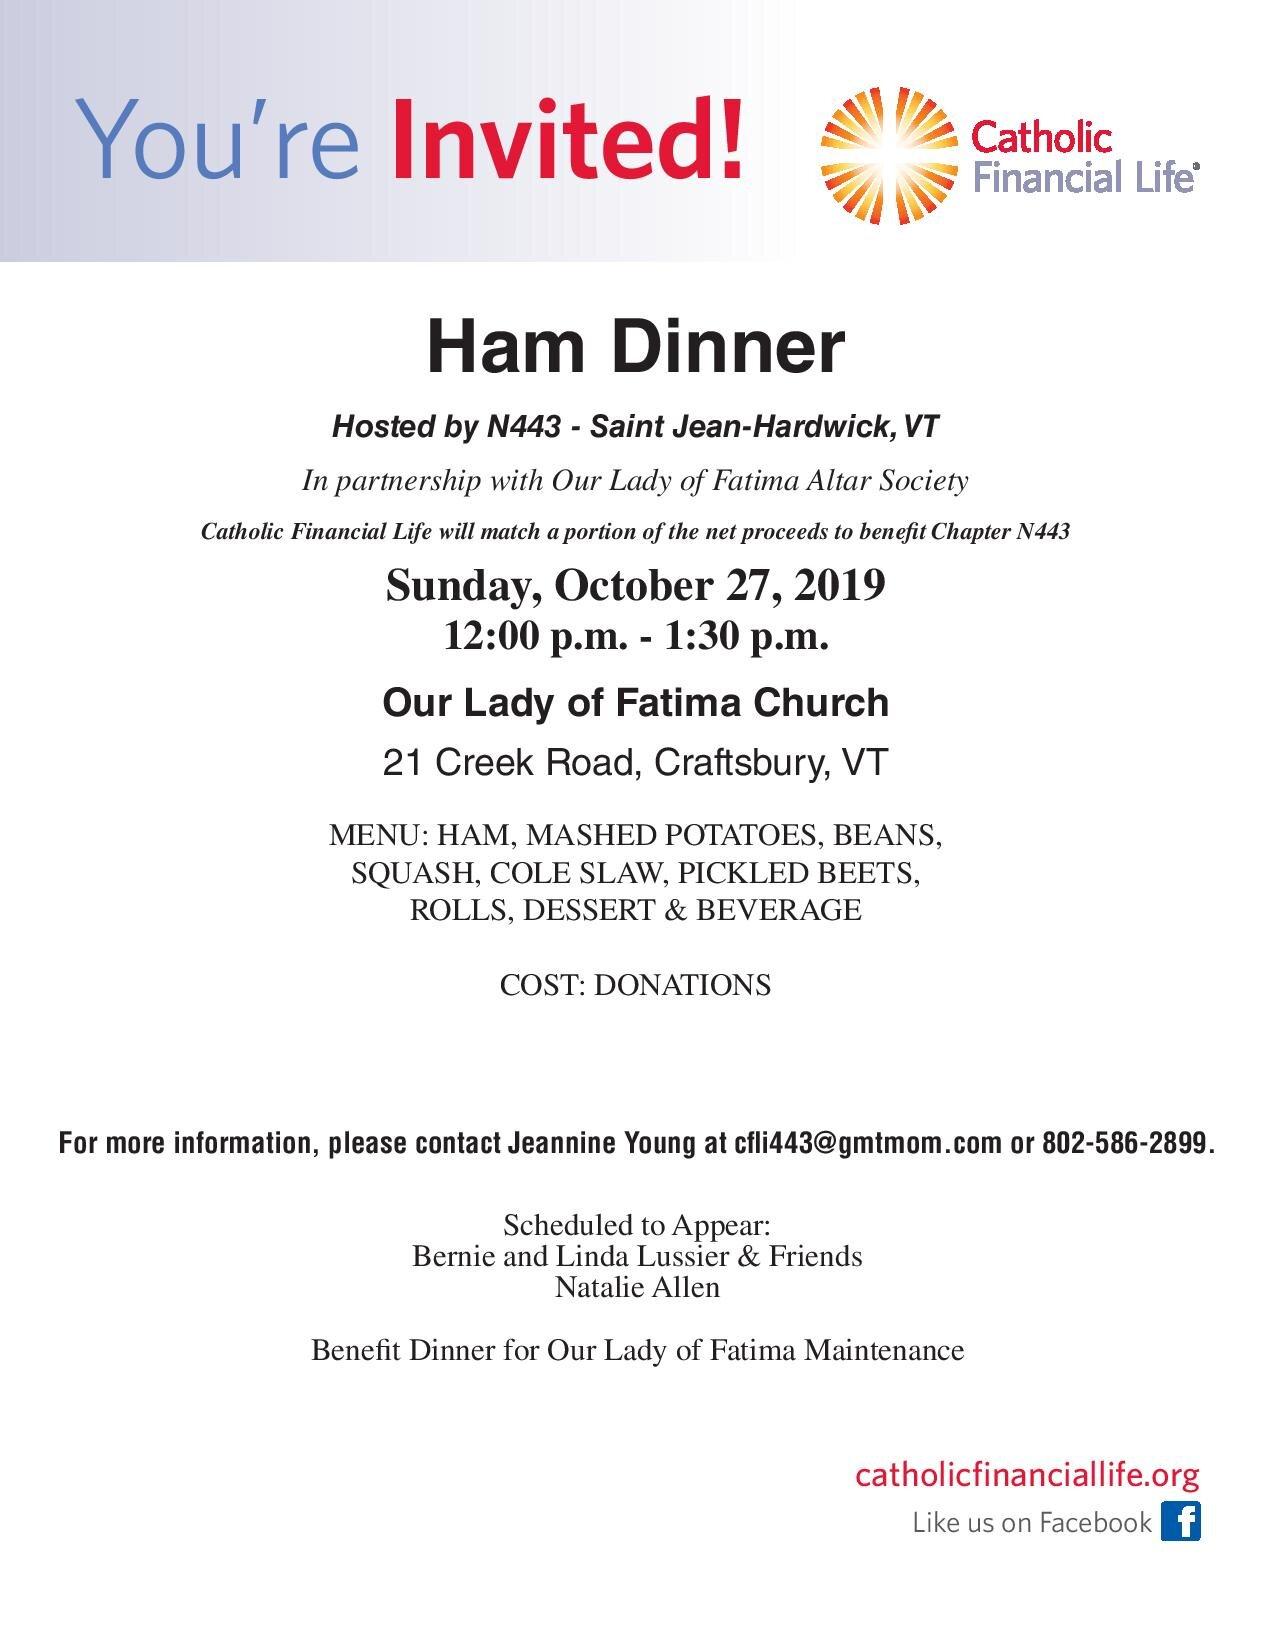 Ham Dinner Flyer 2019-page-001 (1).jpg